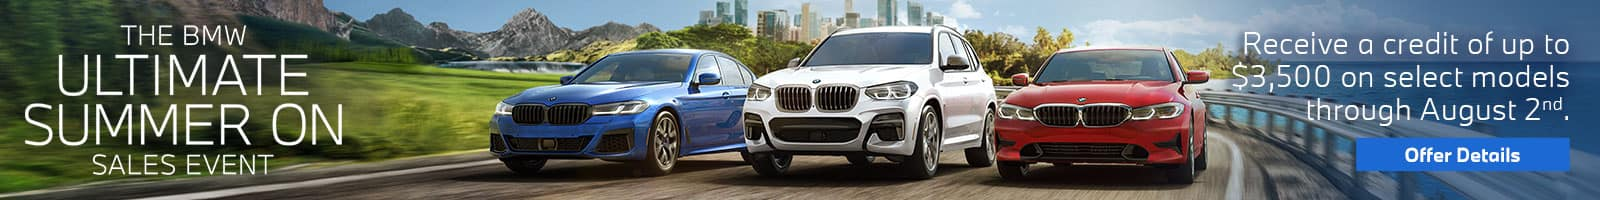 BMW-21102336-SSE-2021-Packshot-VLP-VDP-Banners-1600×200